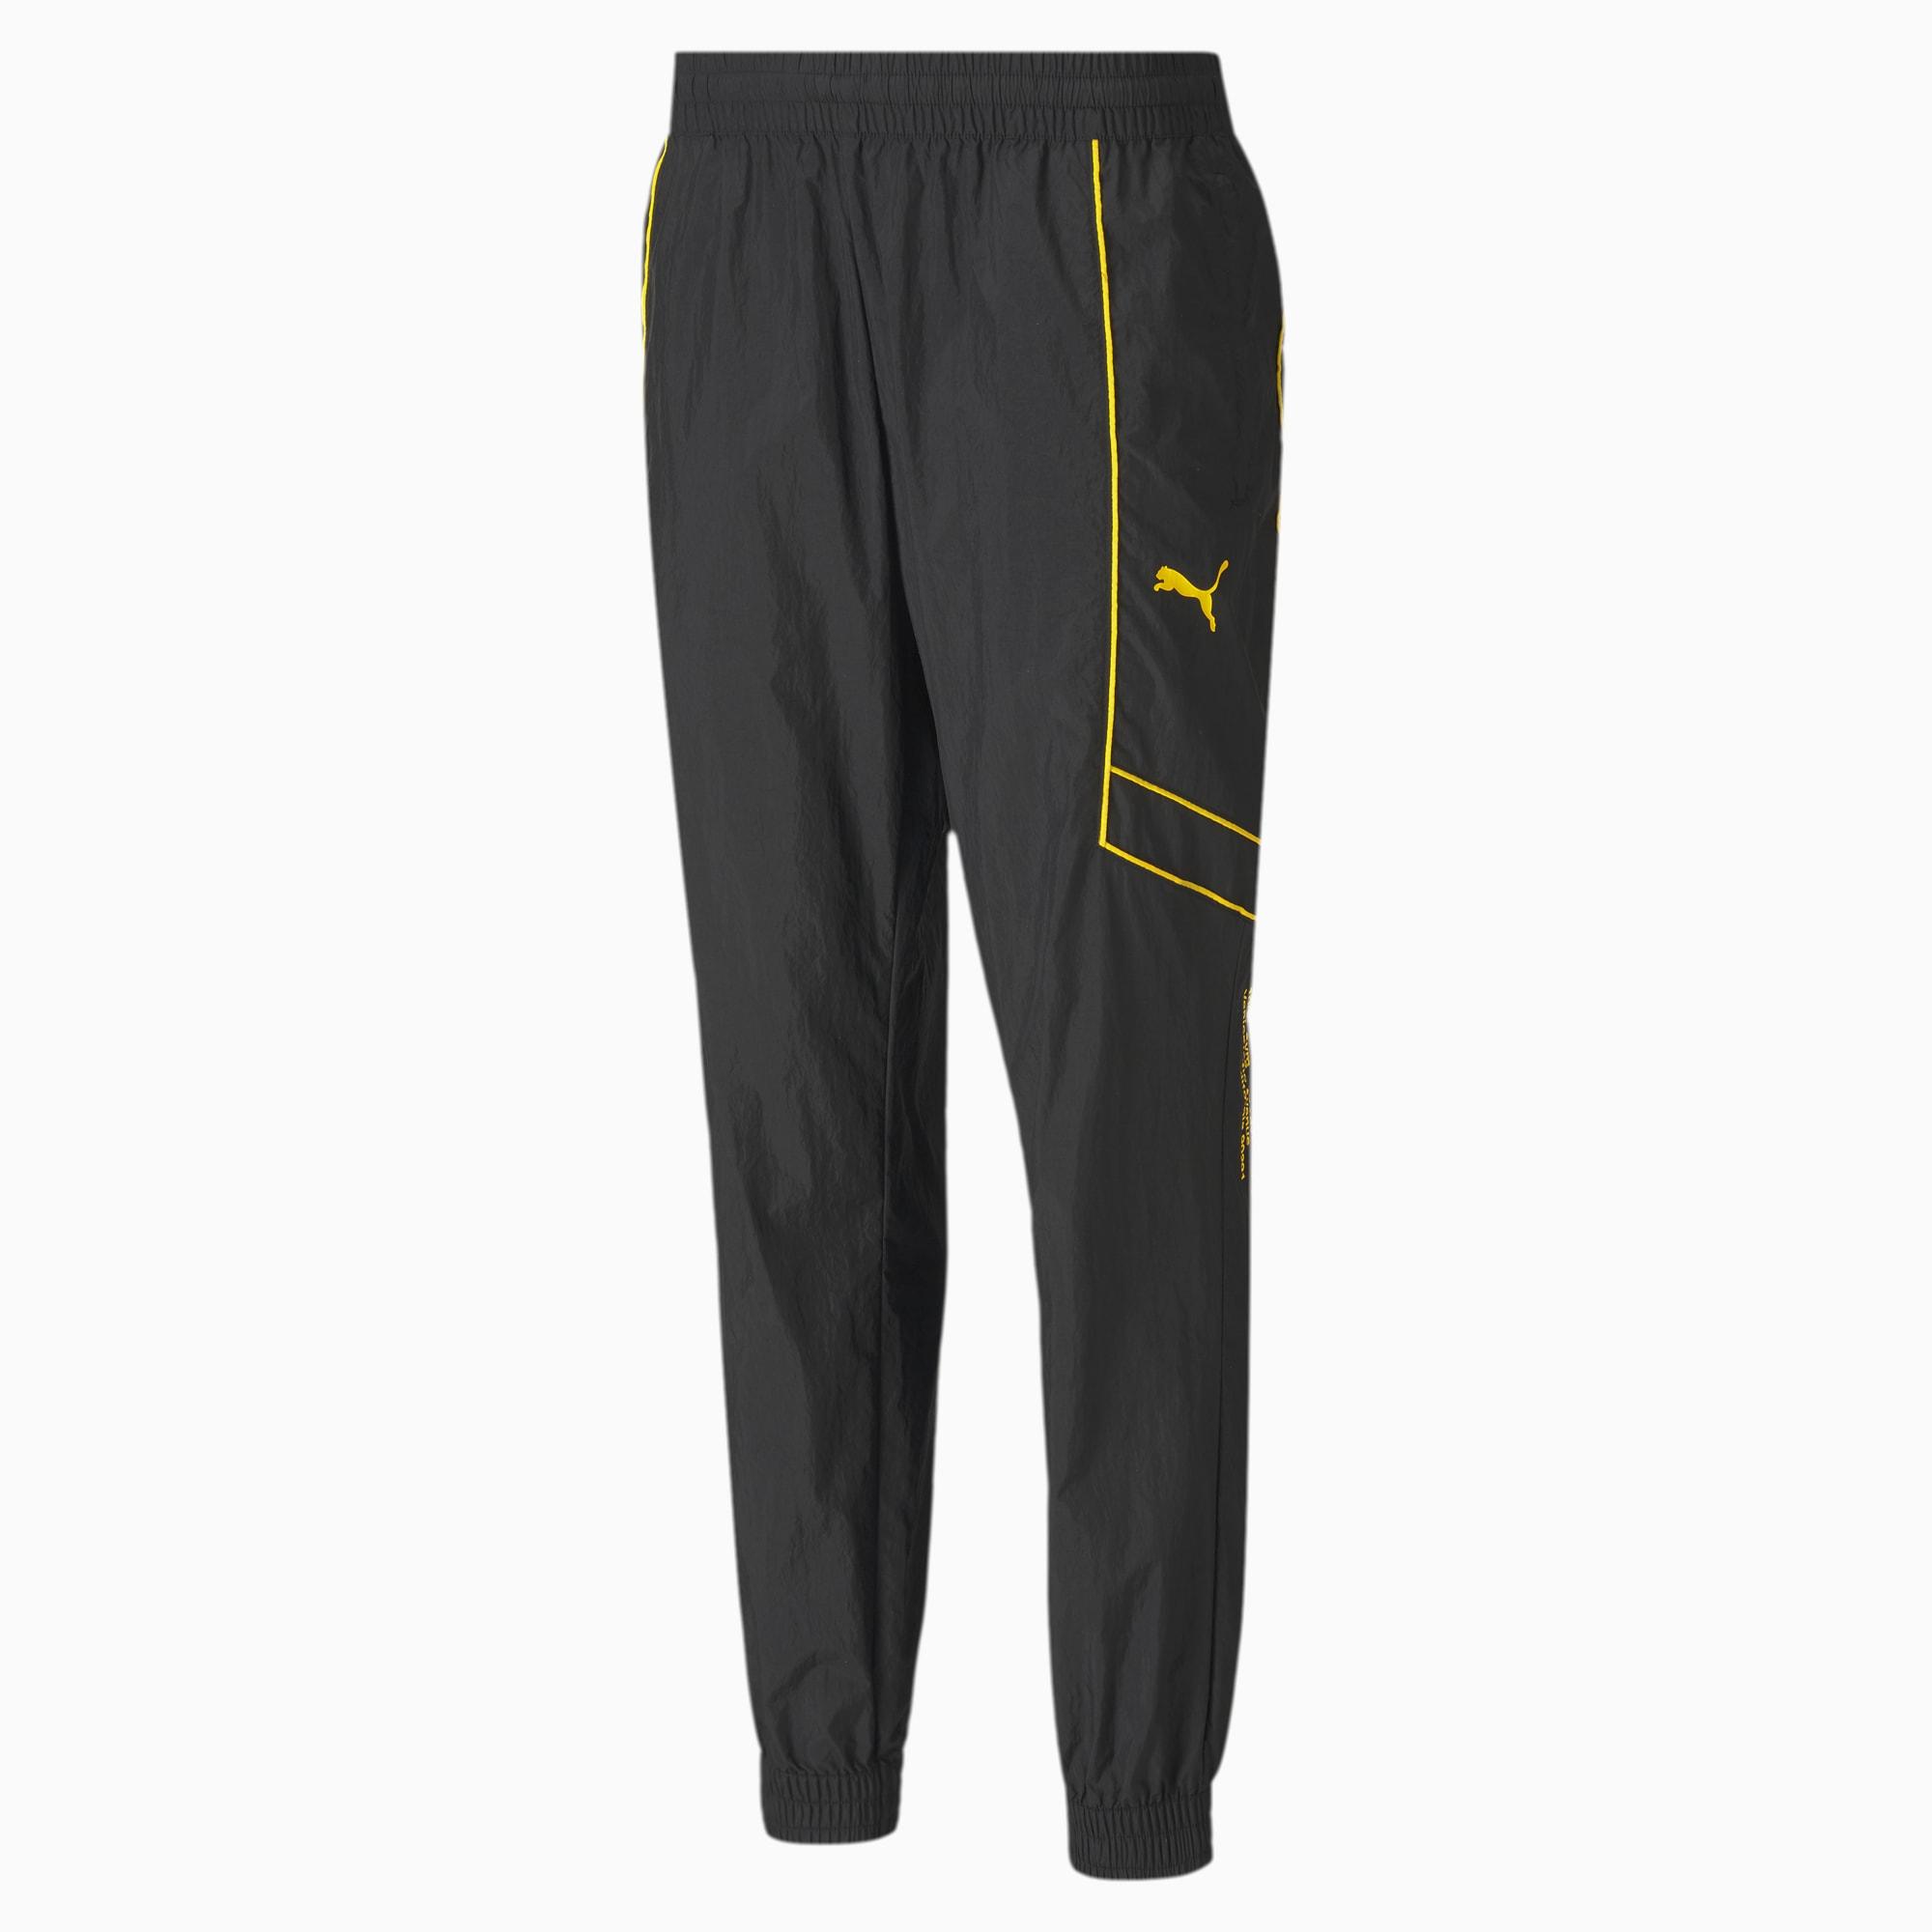 Pantaloni da training PUMA x GOLD'S GYM windCELL in tessuto